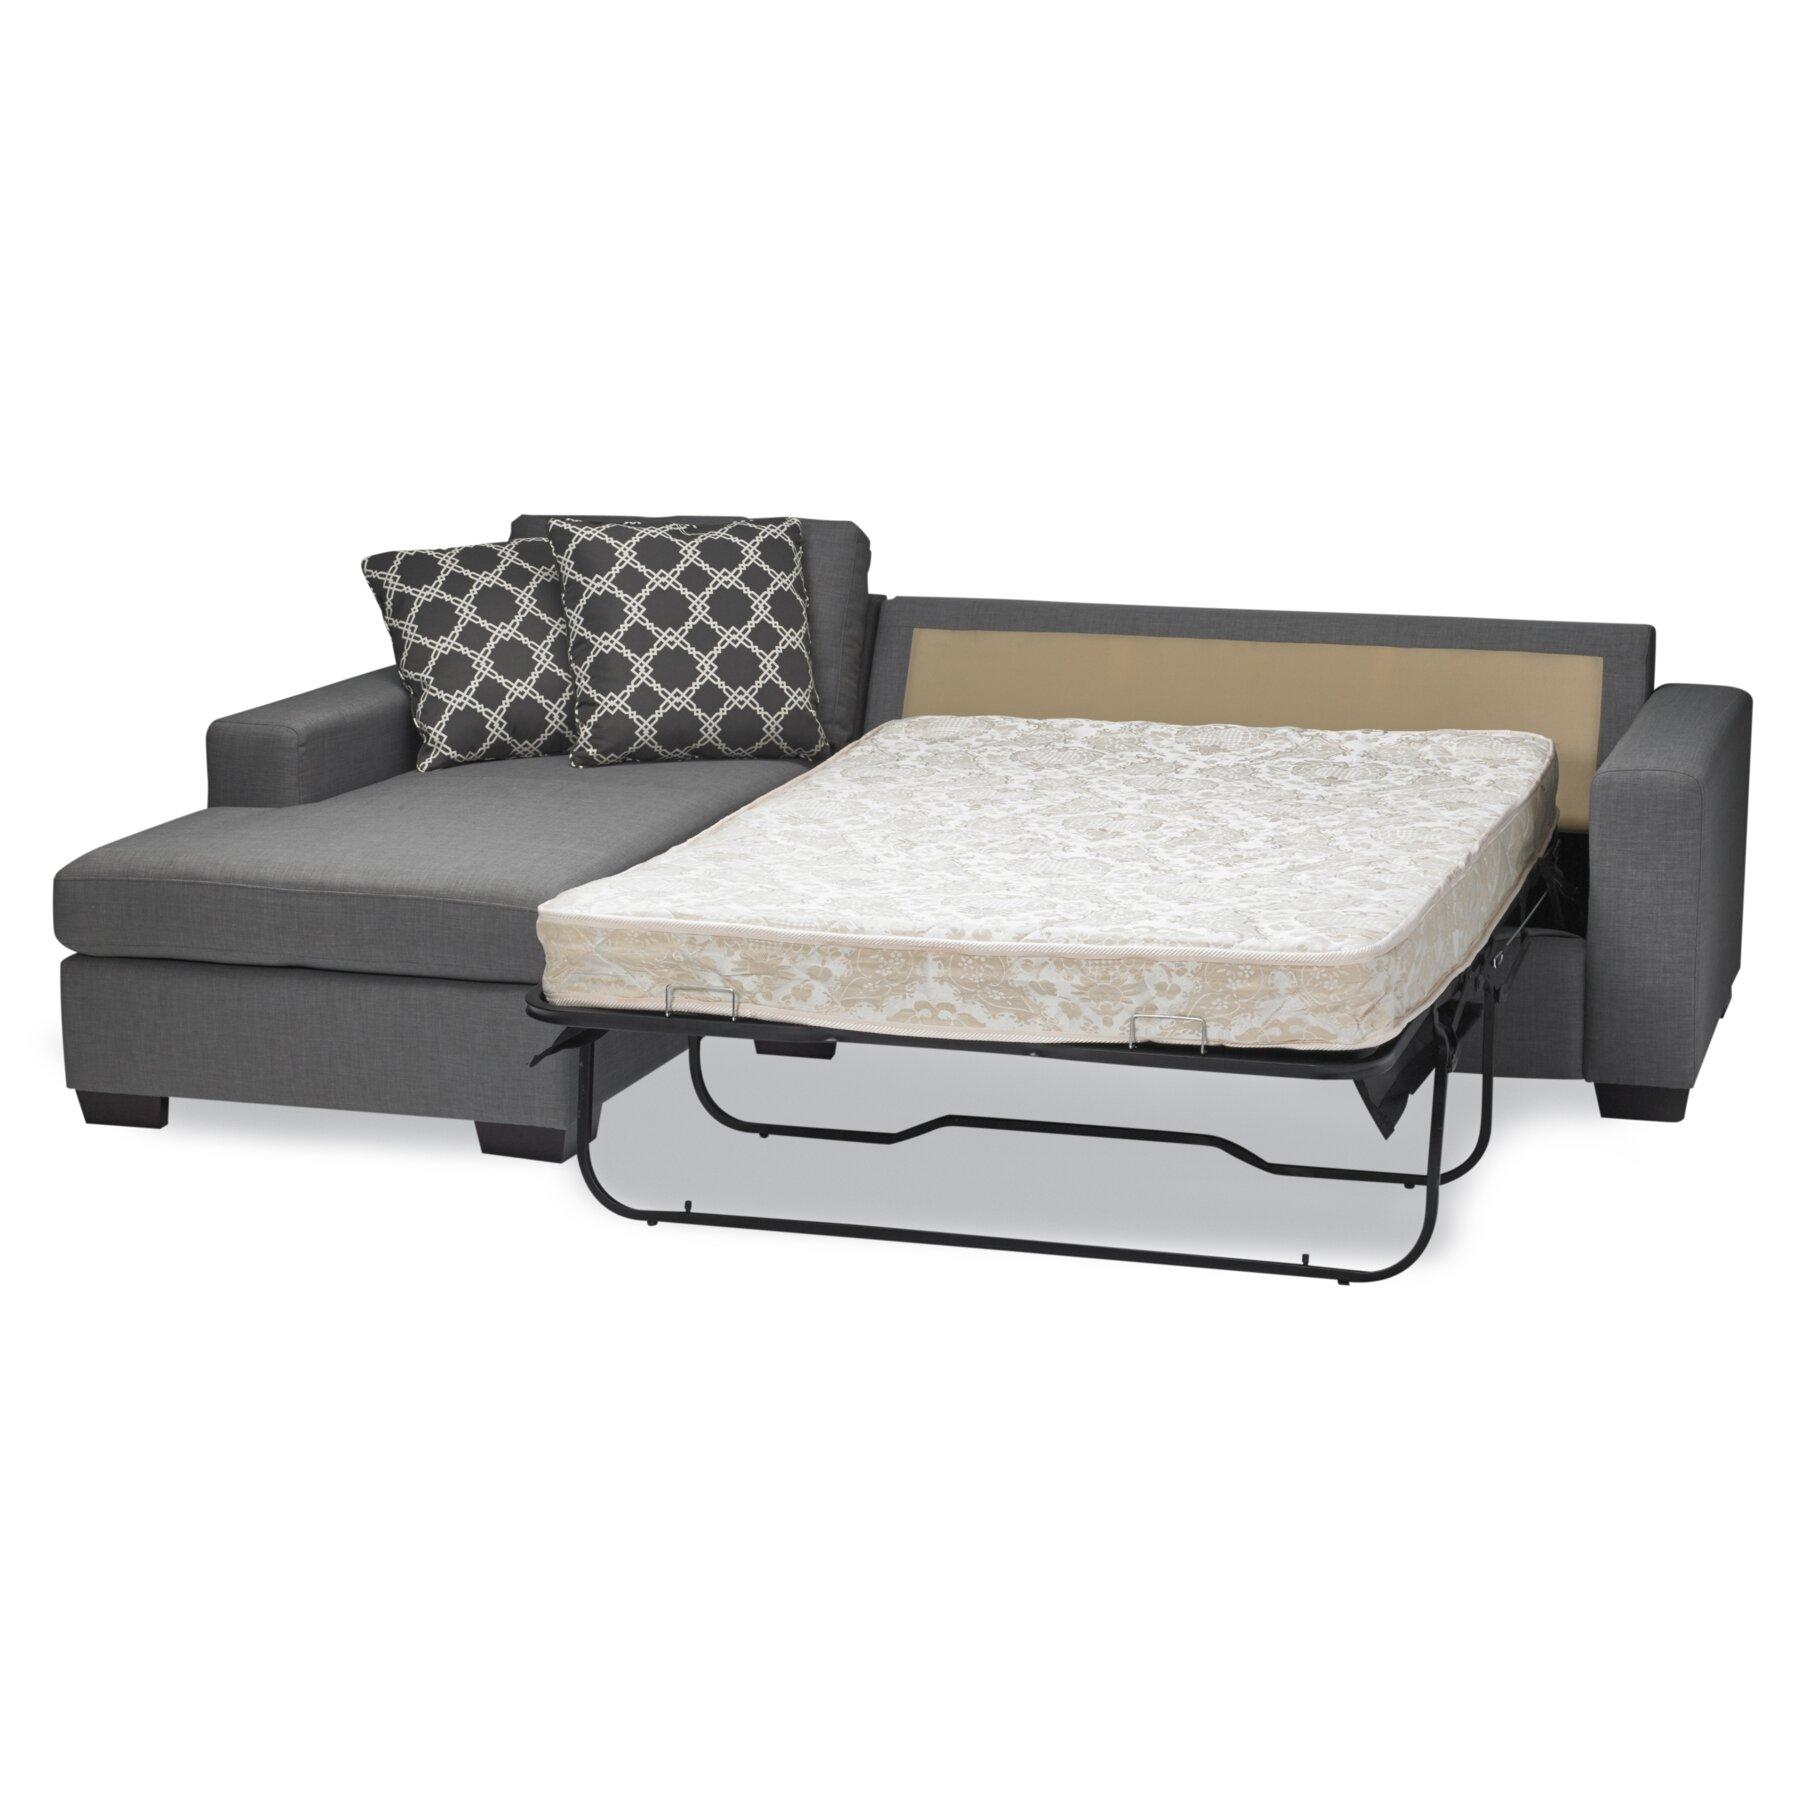 sofas to go mimi sectional reviews wayfair. Black Bedroom Furniture Sets. Home Design Ideas